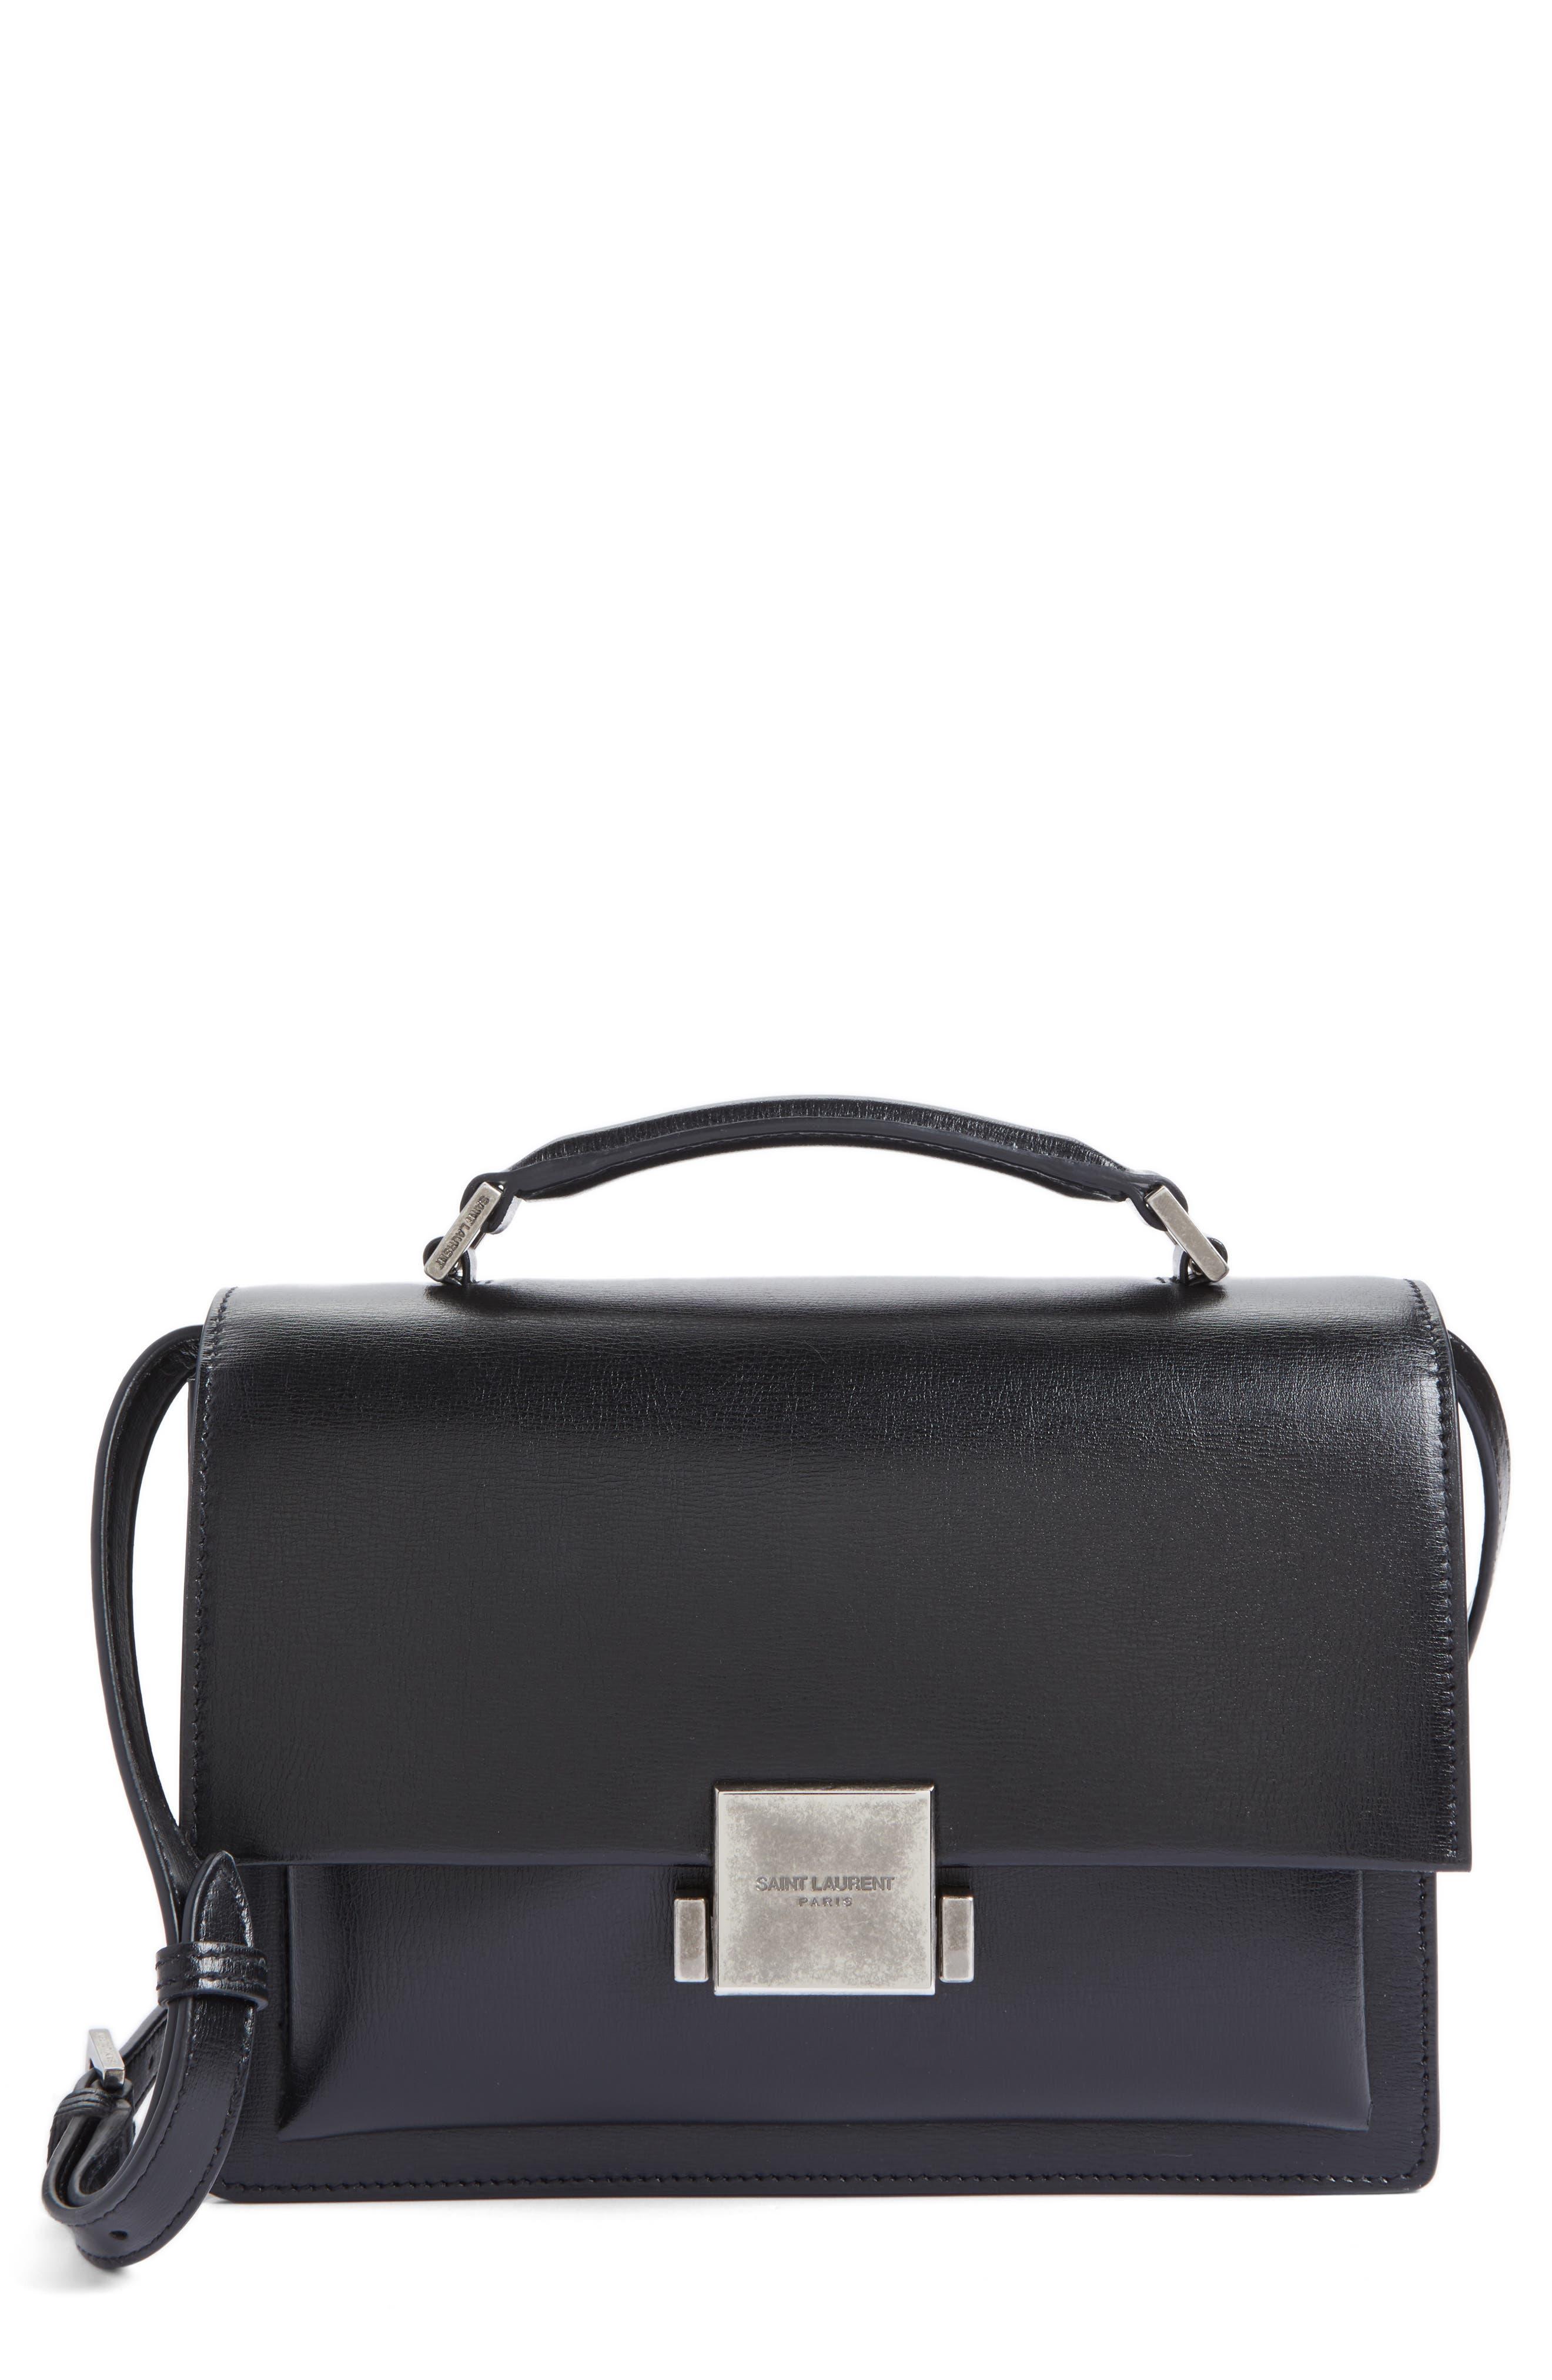 SAINT LAURENT Medium Bellechasse School Leather Shoulder Bag